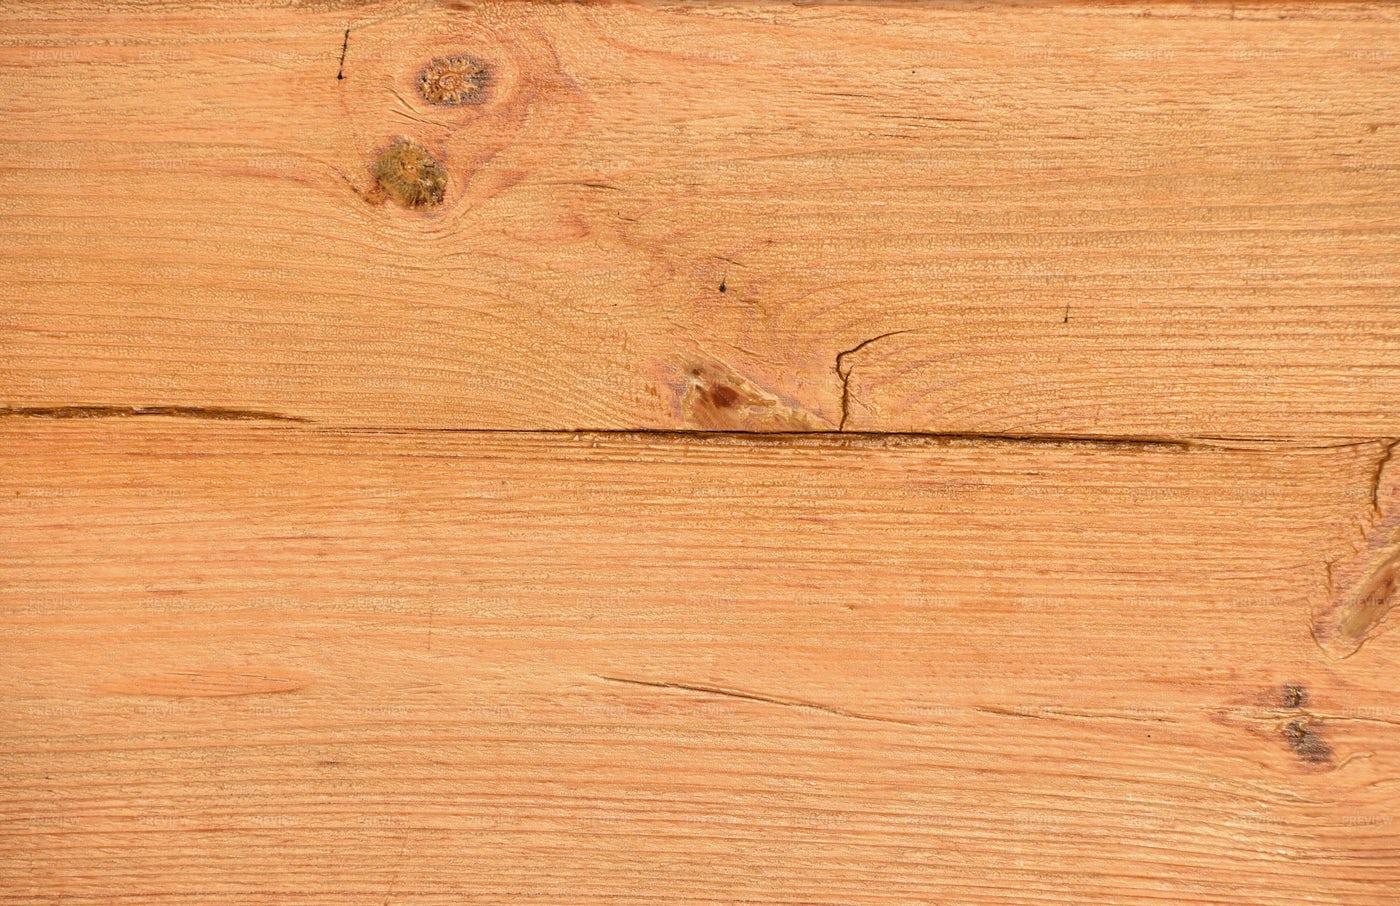 Unpainted Wooden Planks: Stock Photos